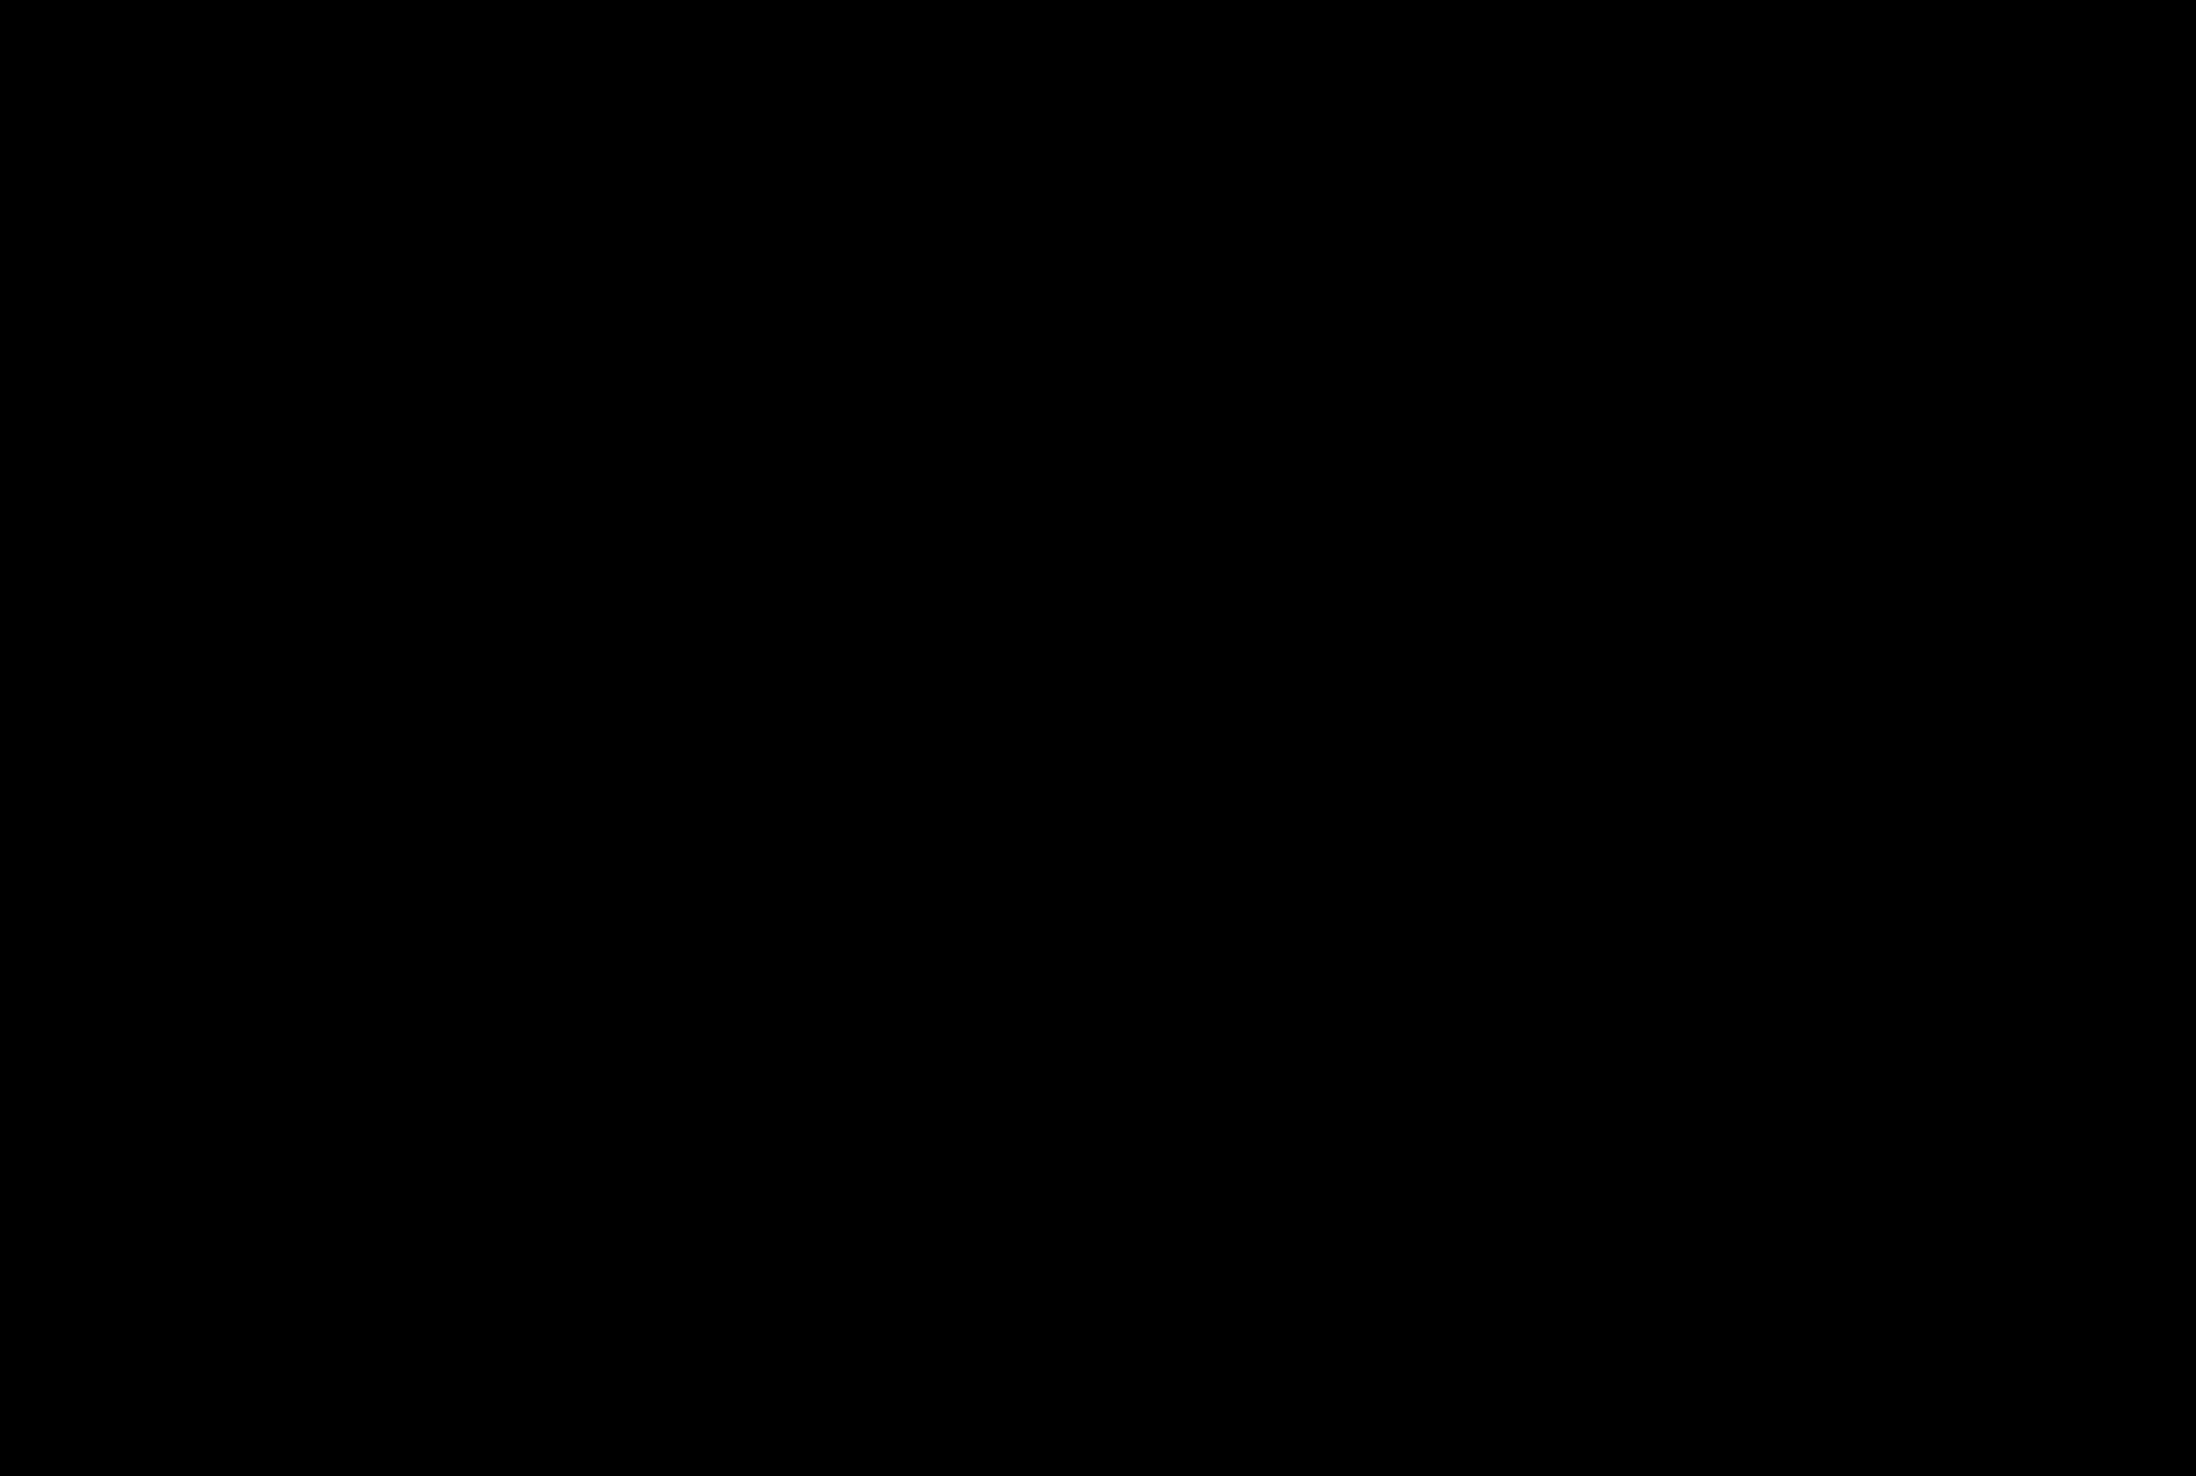 Ambulance clipart logo. Free download clip art